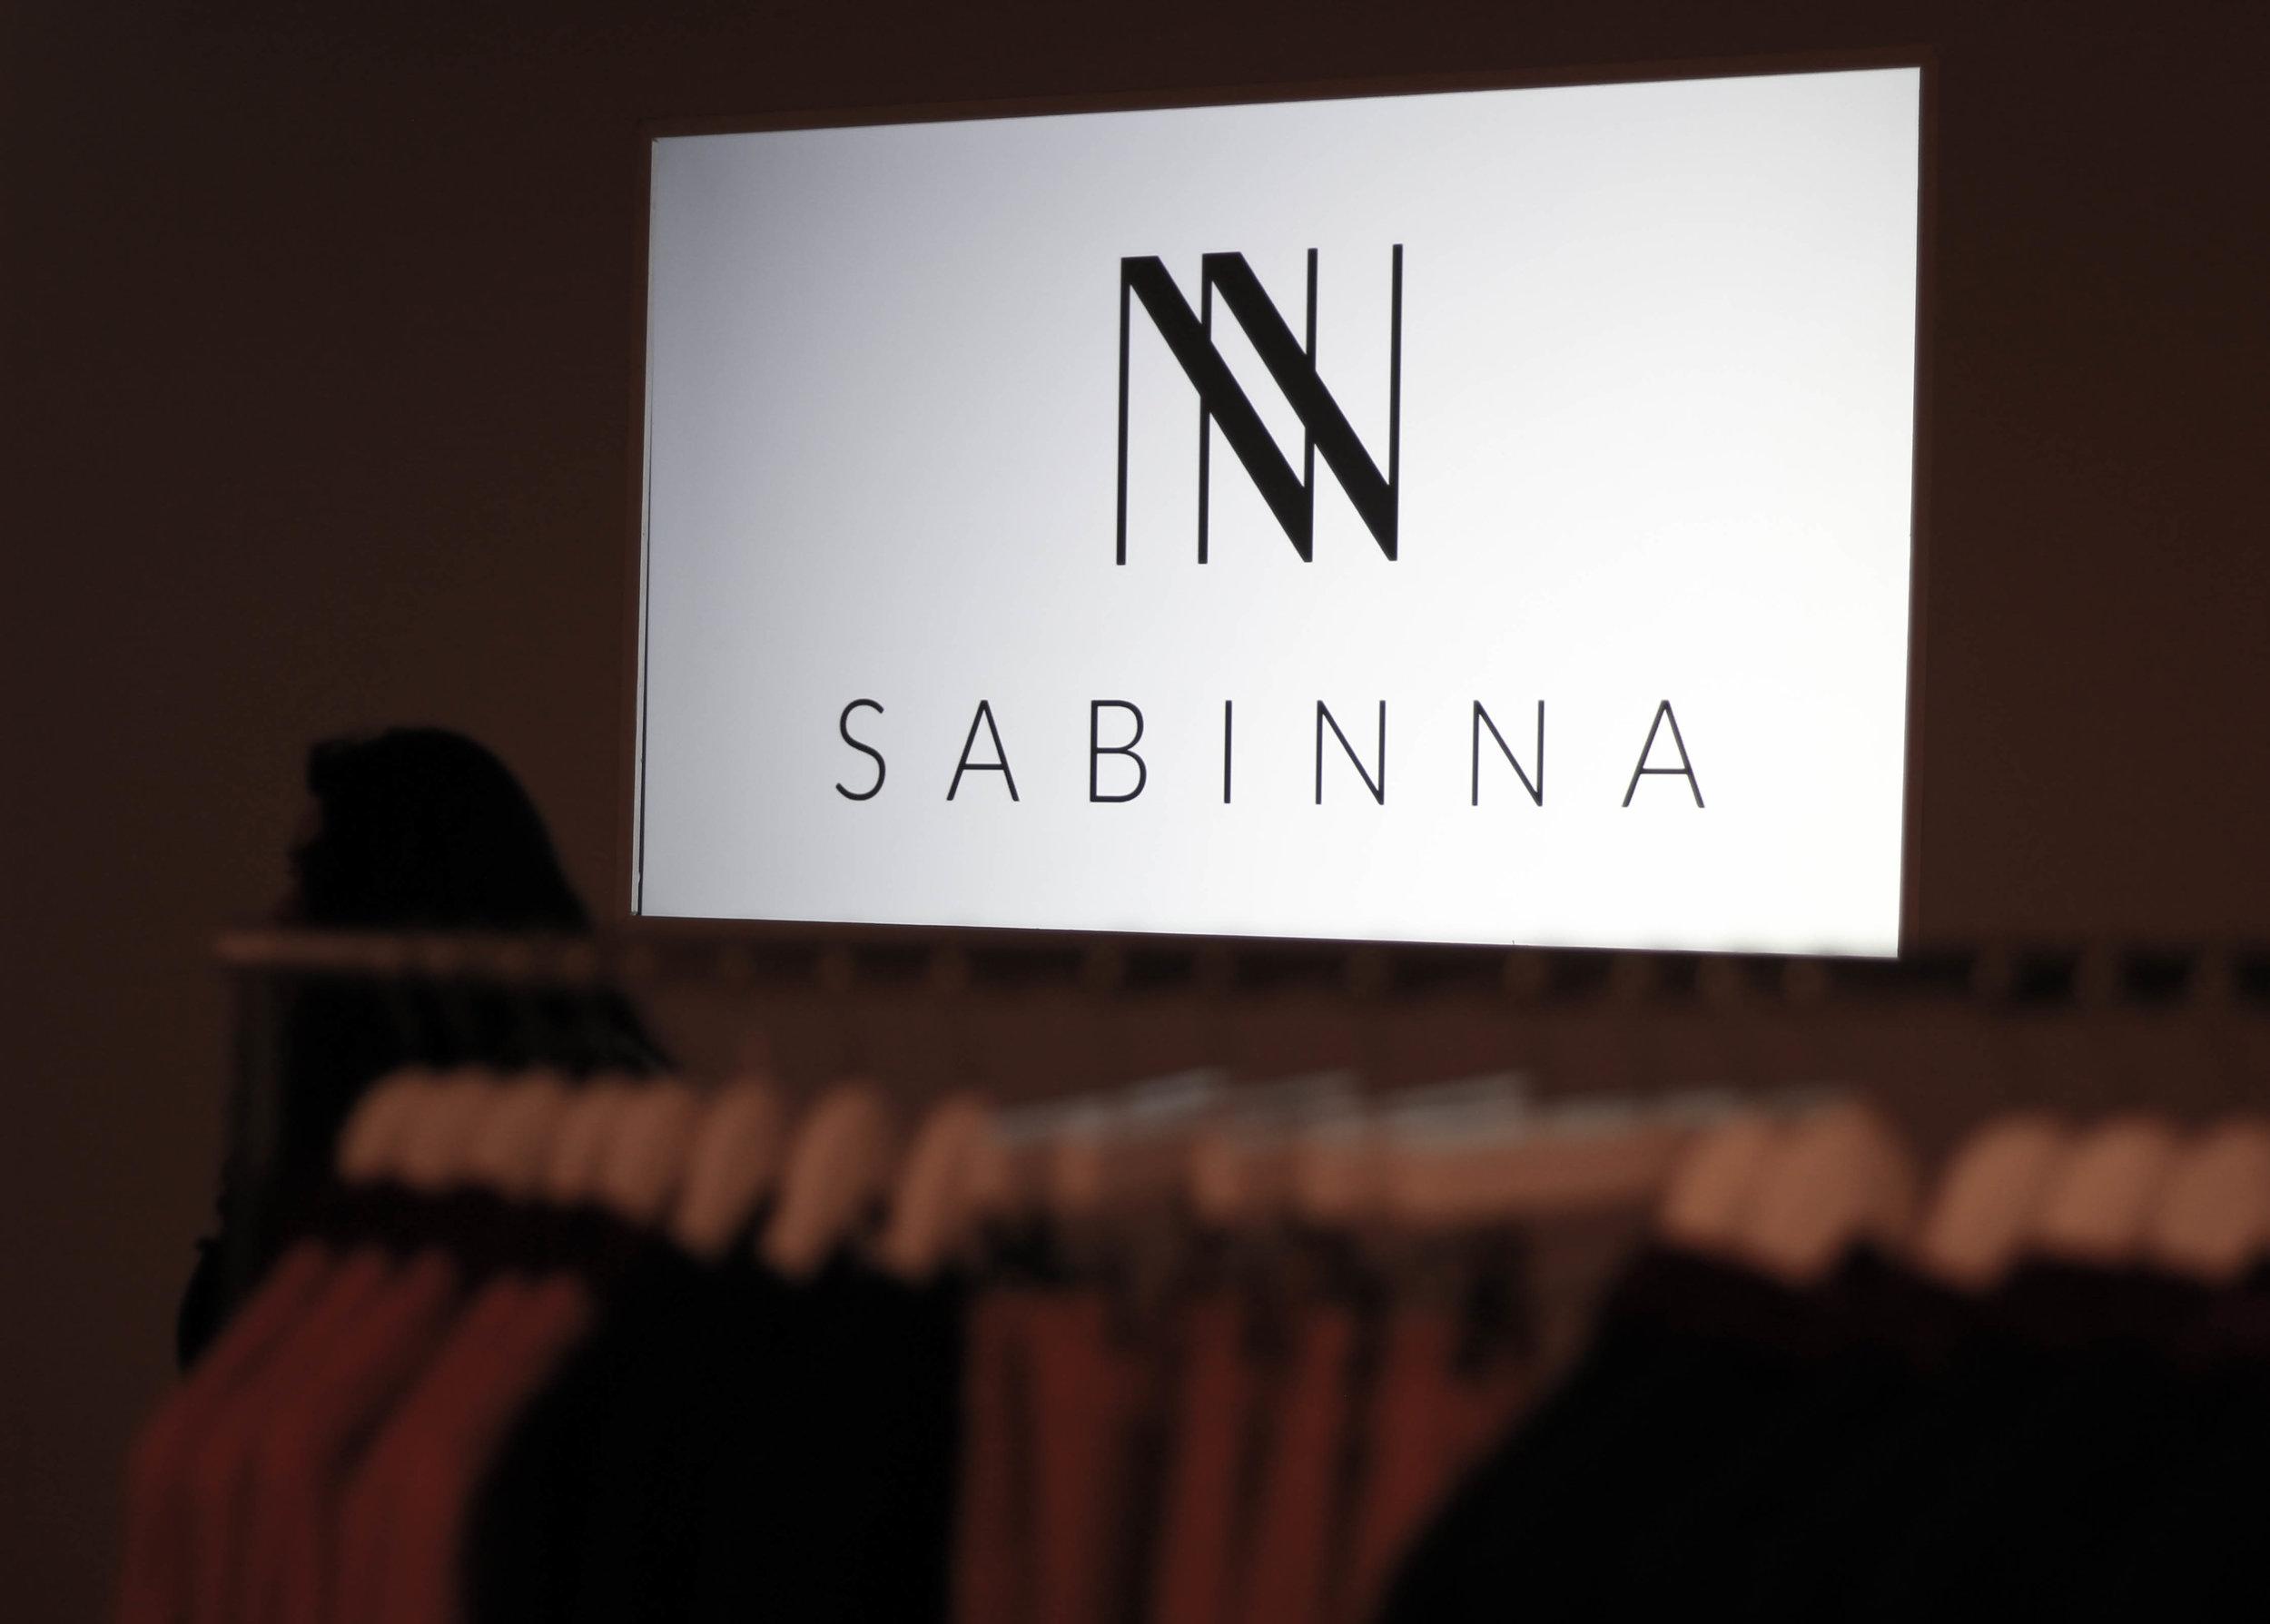 Sabinna_1802_ValeriaBard-11.jpg